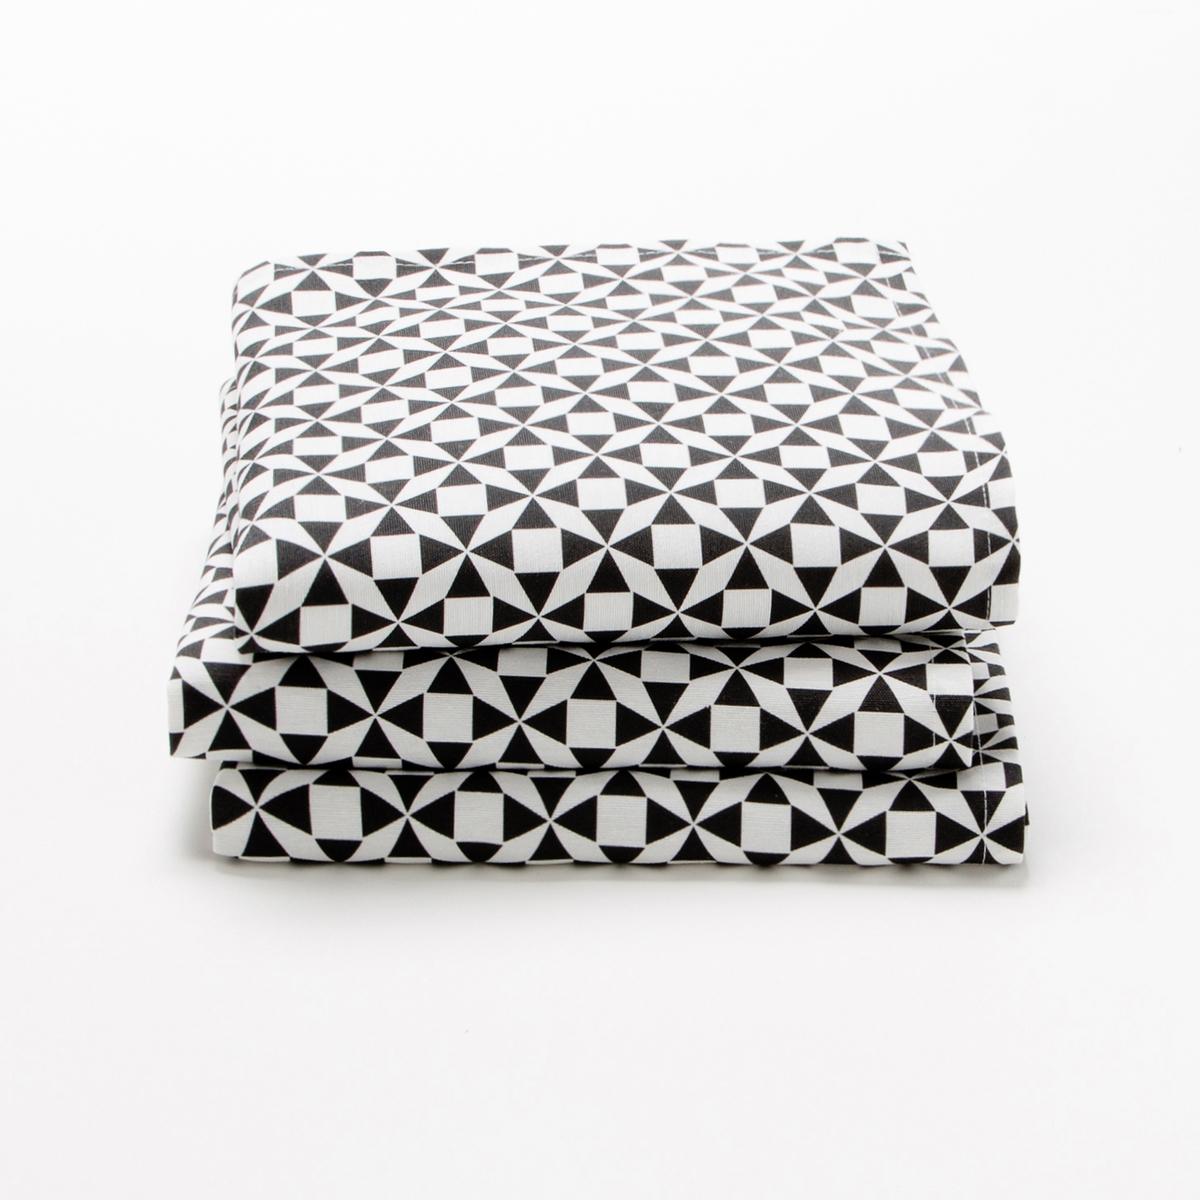 3 столовых полотенца, Cisare